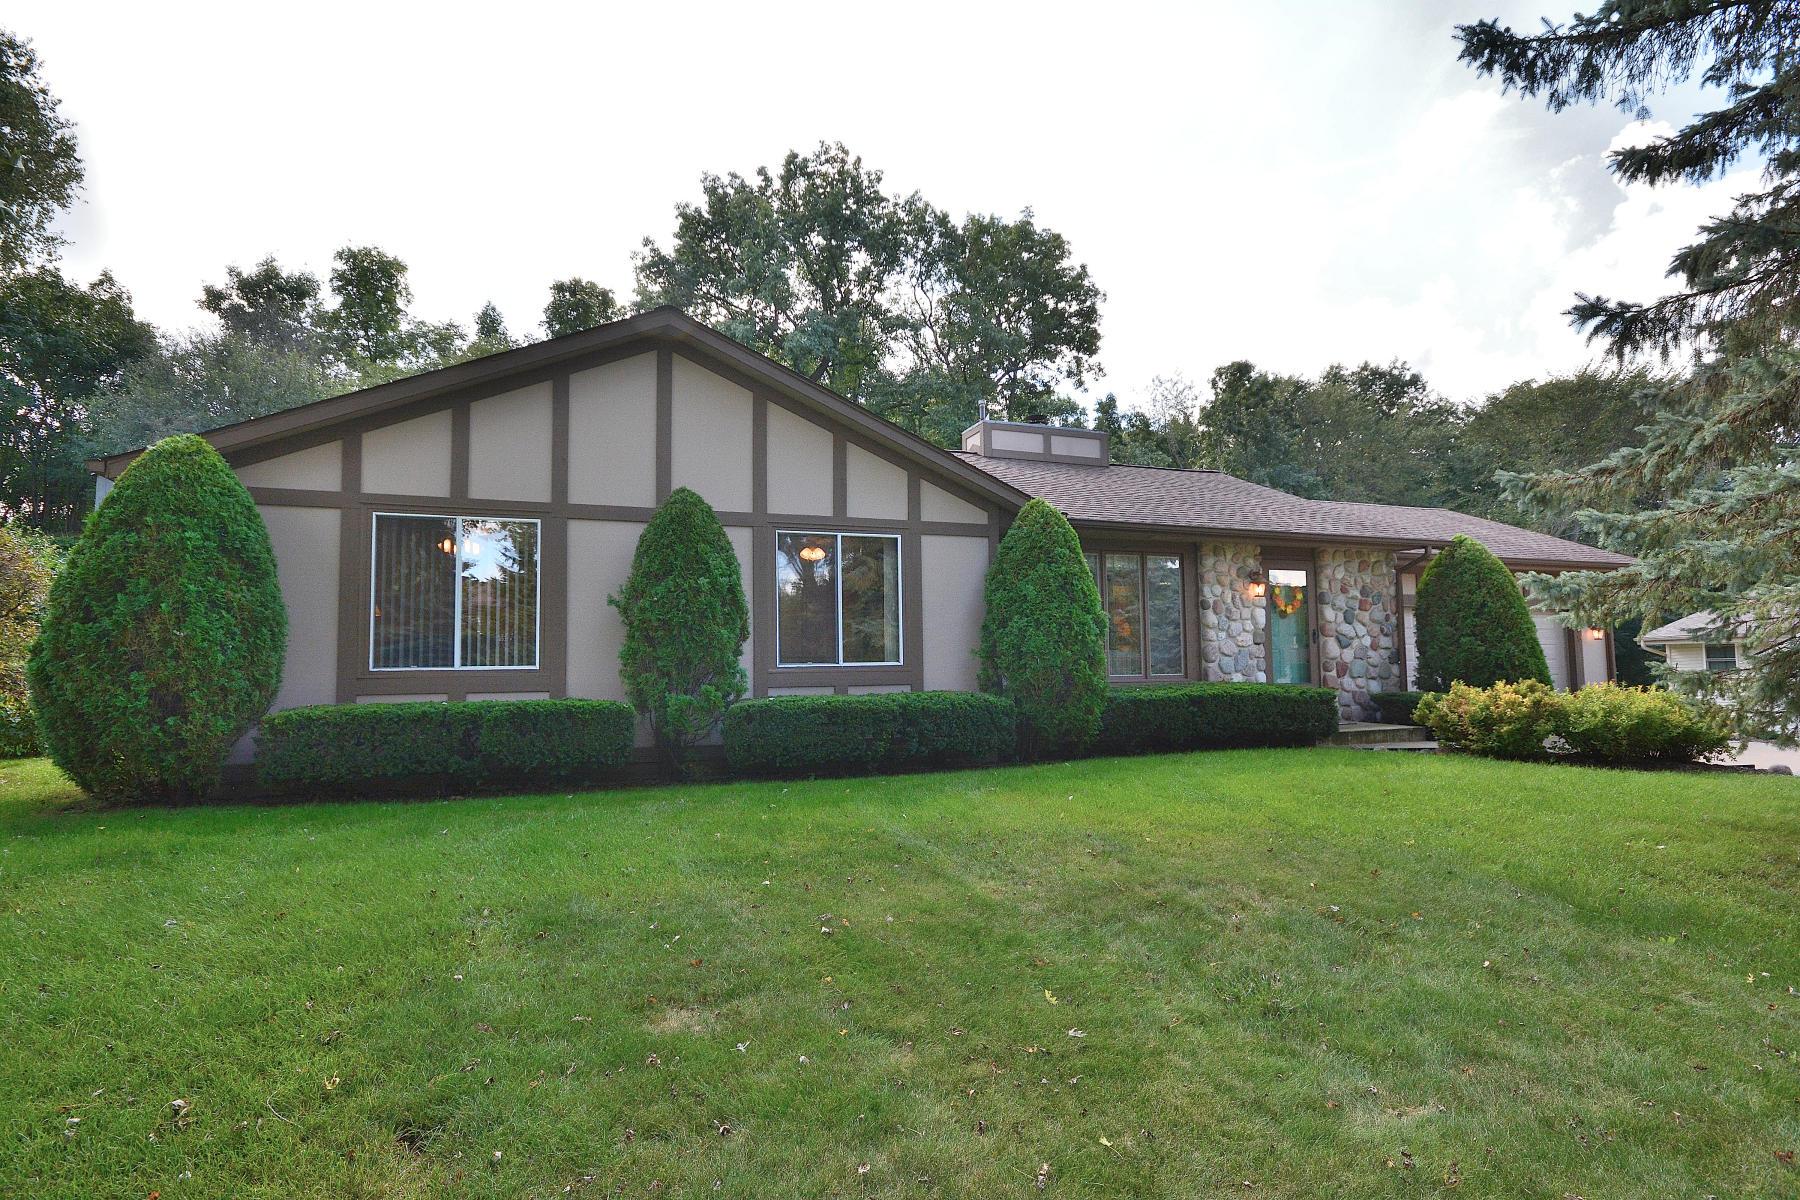 809 Crescent Ln, Hartland, Wisconsin 53029, 3 Bedrooms Bedrooms, 6 Rooms Rooms,2 BathroomsBathrooms,Single-Family,For Sale,Crescent Ln,1607893